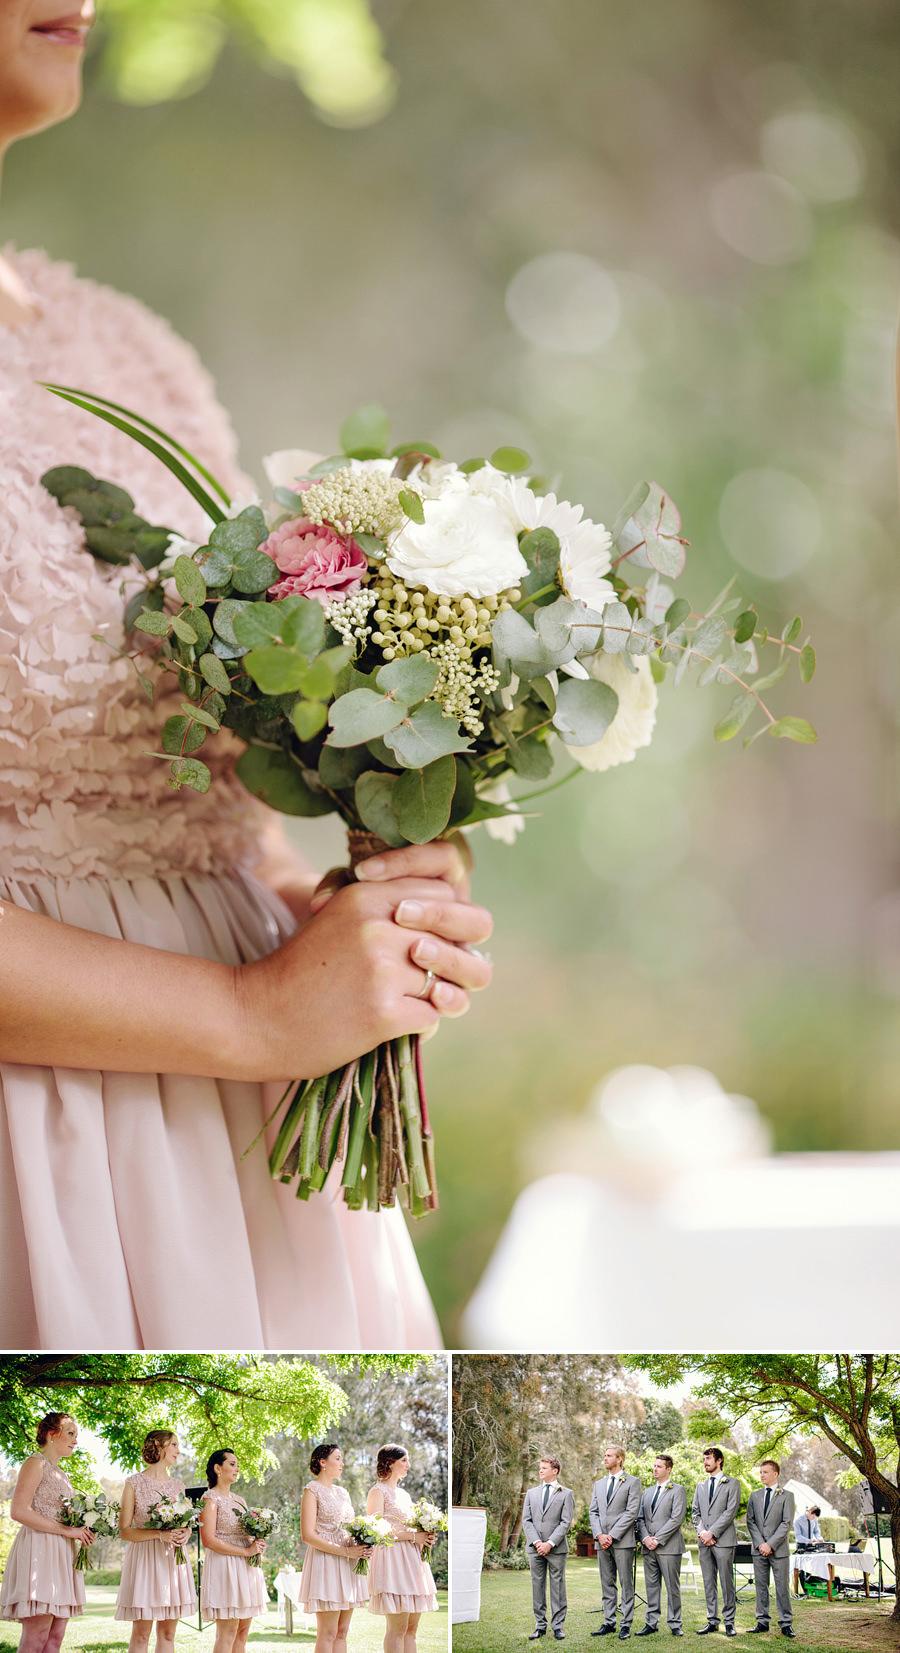 Sydney Wedding Photographer: Bridesmaids